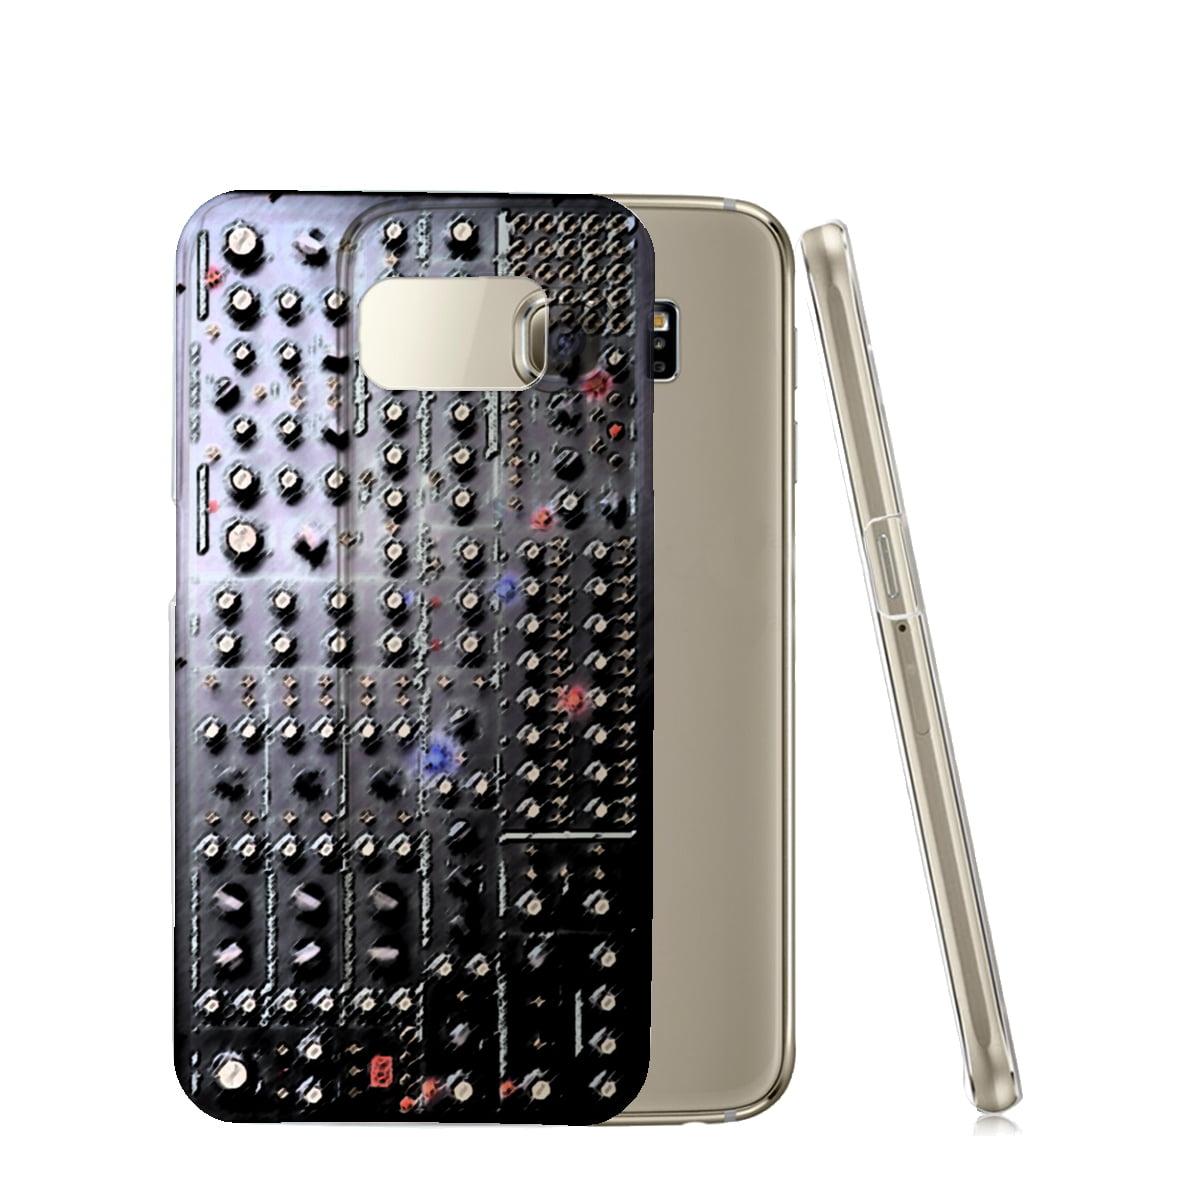 KuzmarK™ Samsung Galaxy S6 Edge Clear Cover Case - Analog Synthesizer